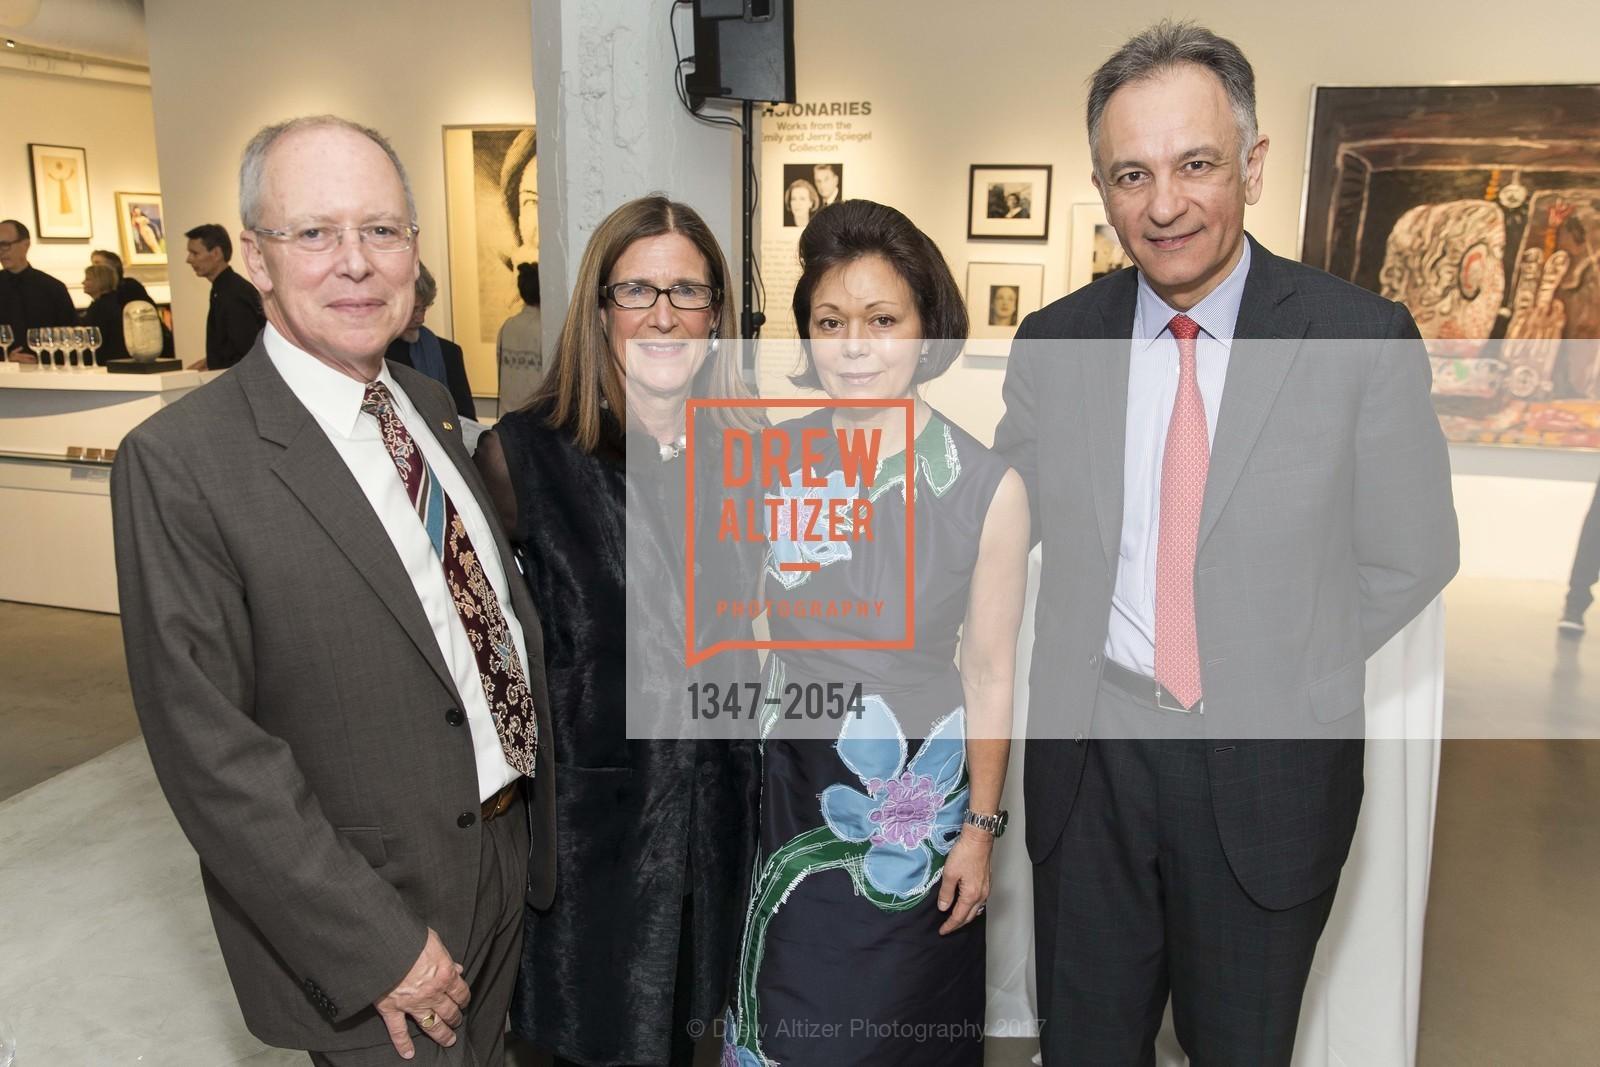 Charles Desmarais, Ellanor Notides, Laura Paulson, Guillaume Cerutti, Christie's Spring Tour 2017, Wendi Norris Gallery. Van 161 Jesse Street, April 20th, 2017